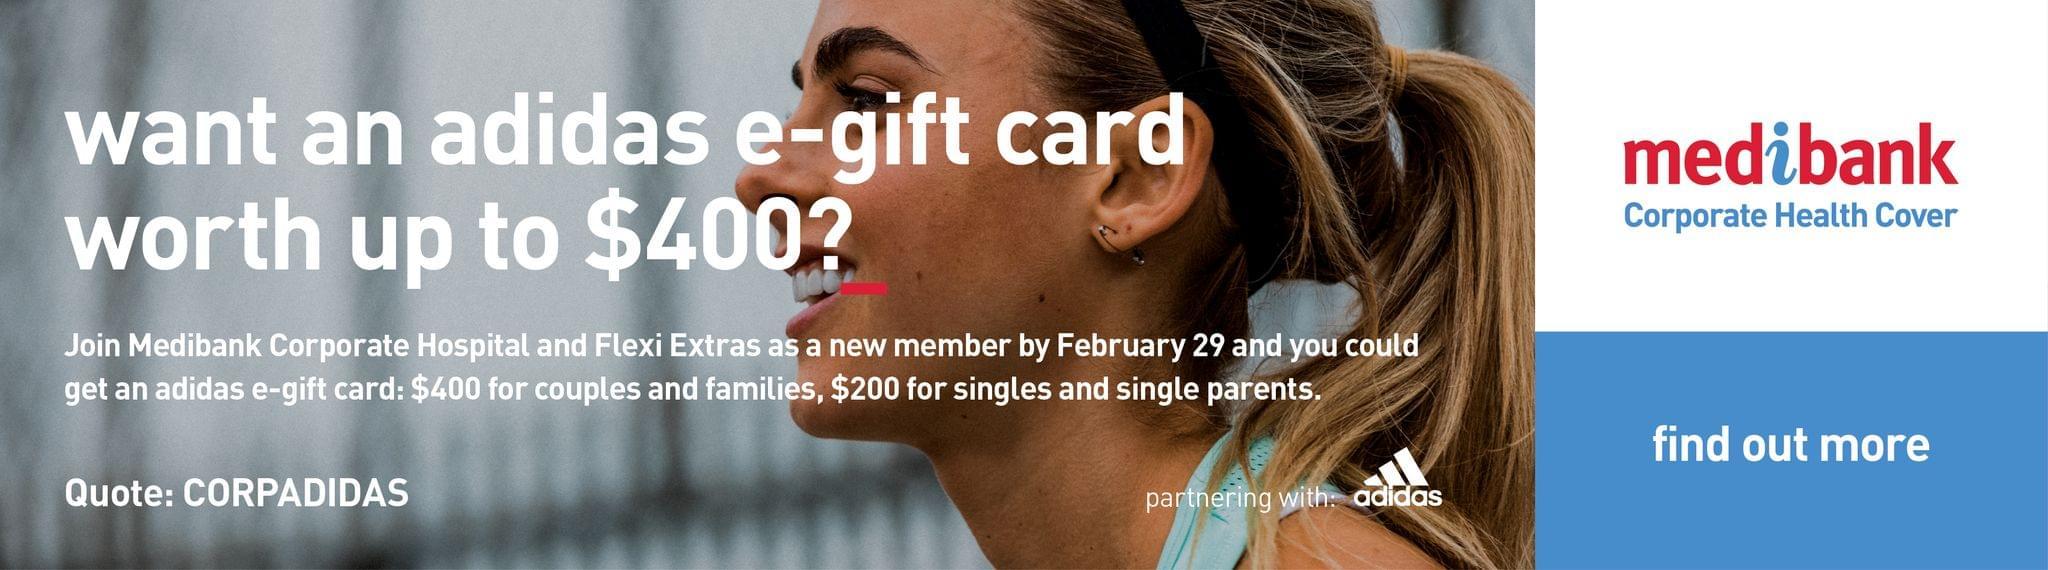 Medibank Adidas Feb 2020